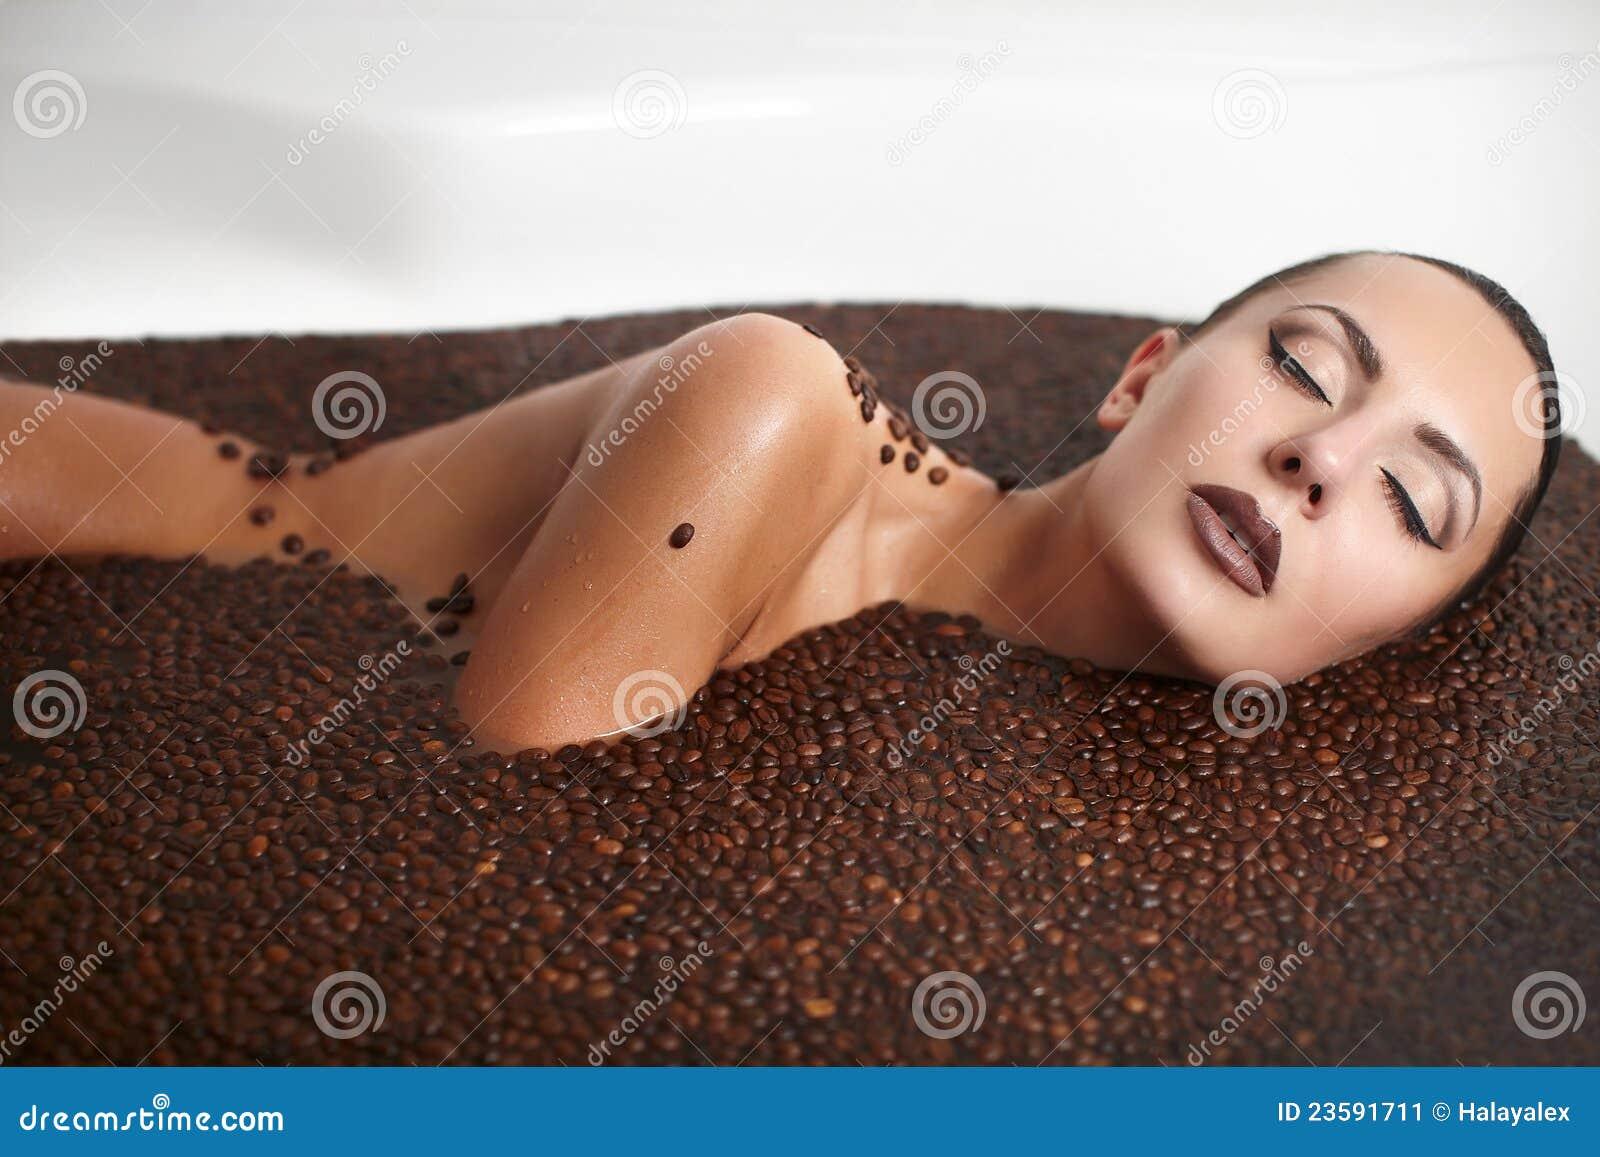 Beautiful fashion girl in jacuzzi with coffee